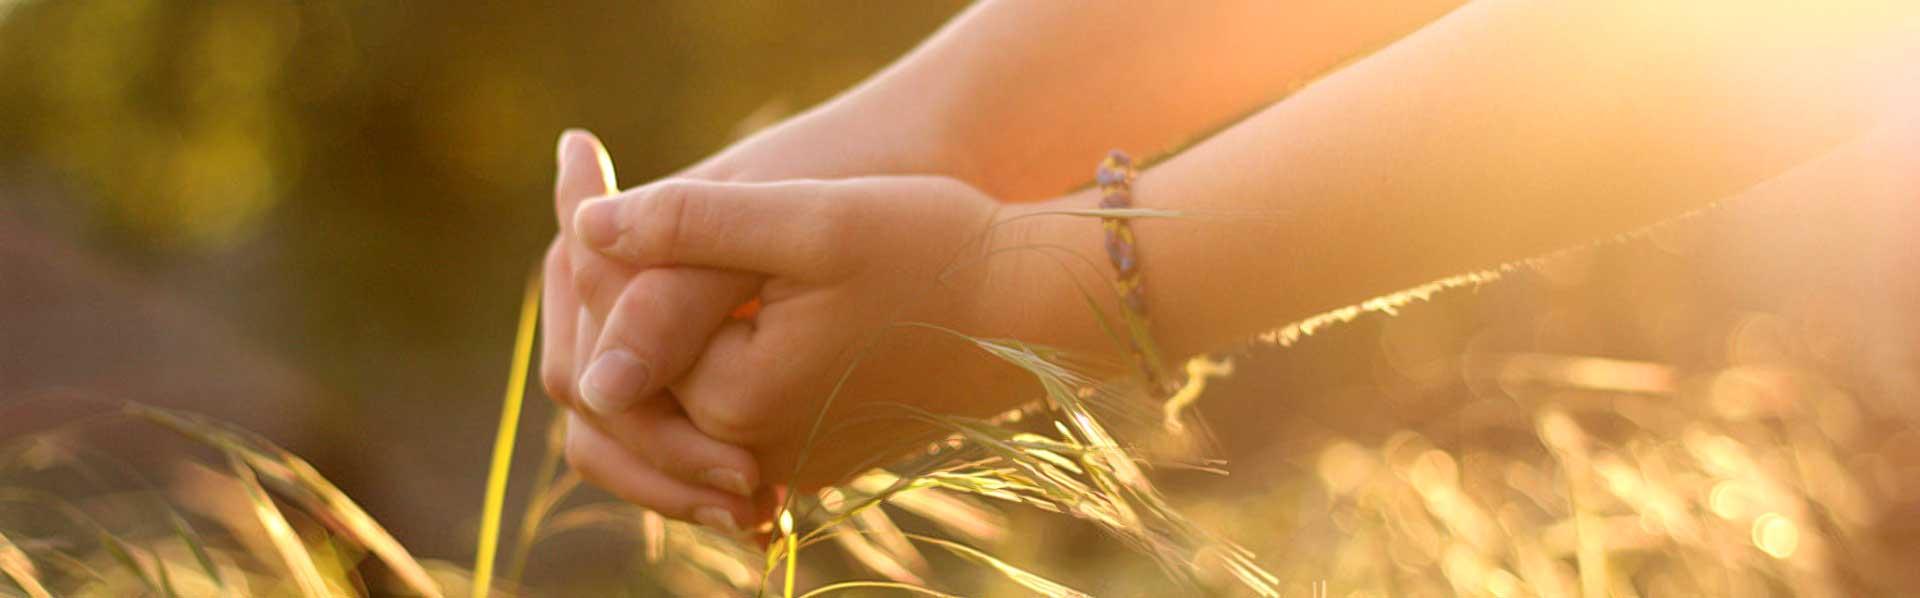 espiritismo-hands-divider